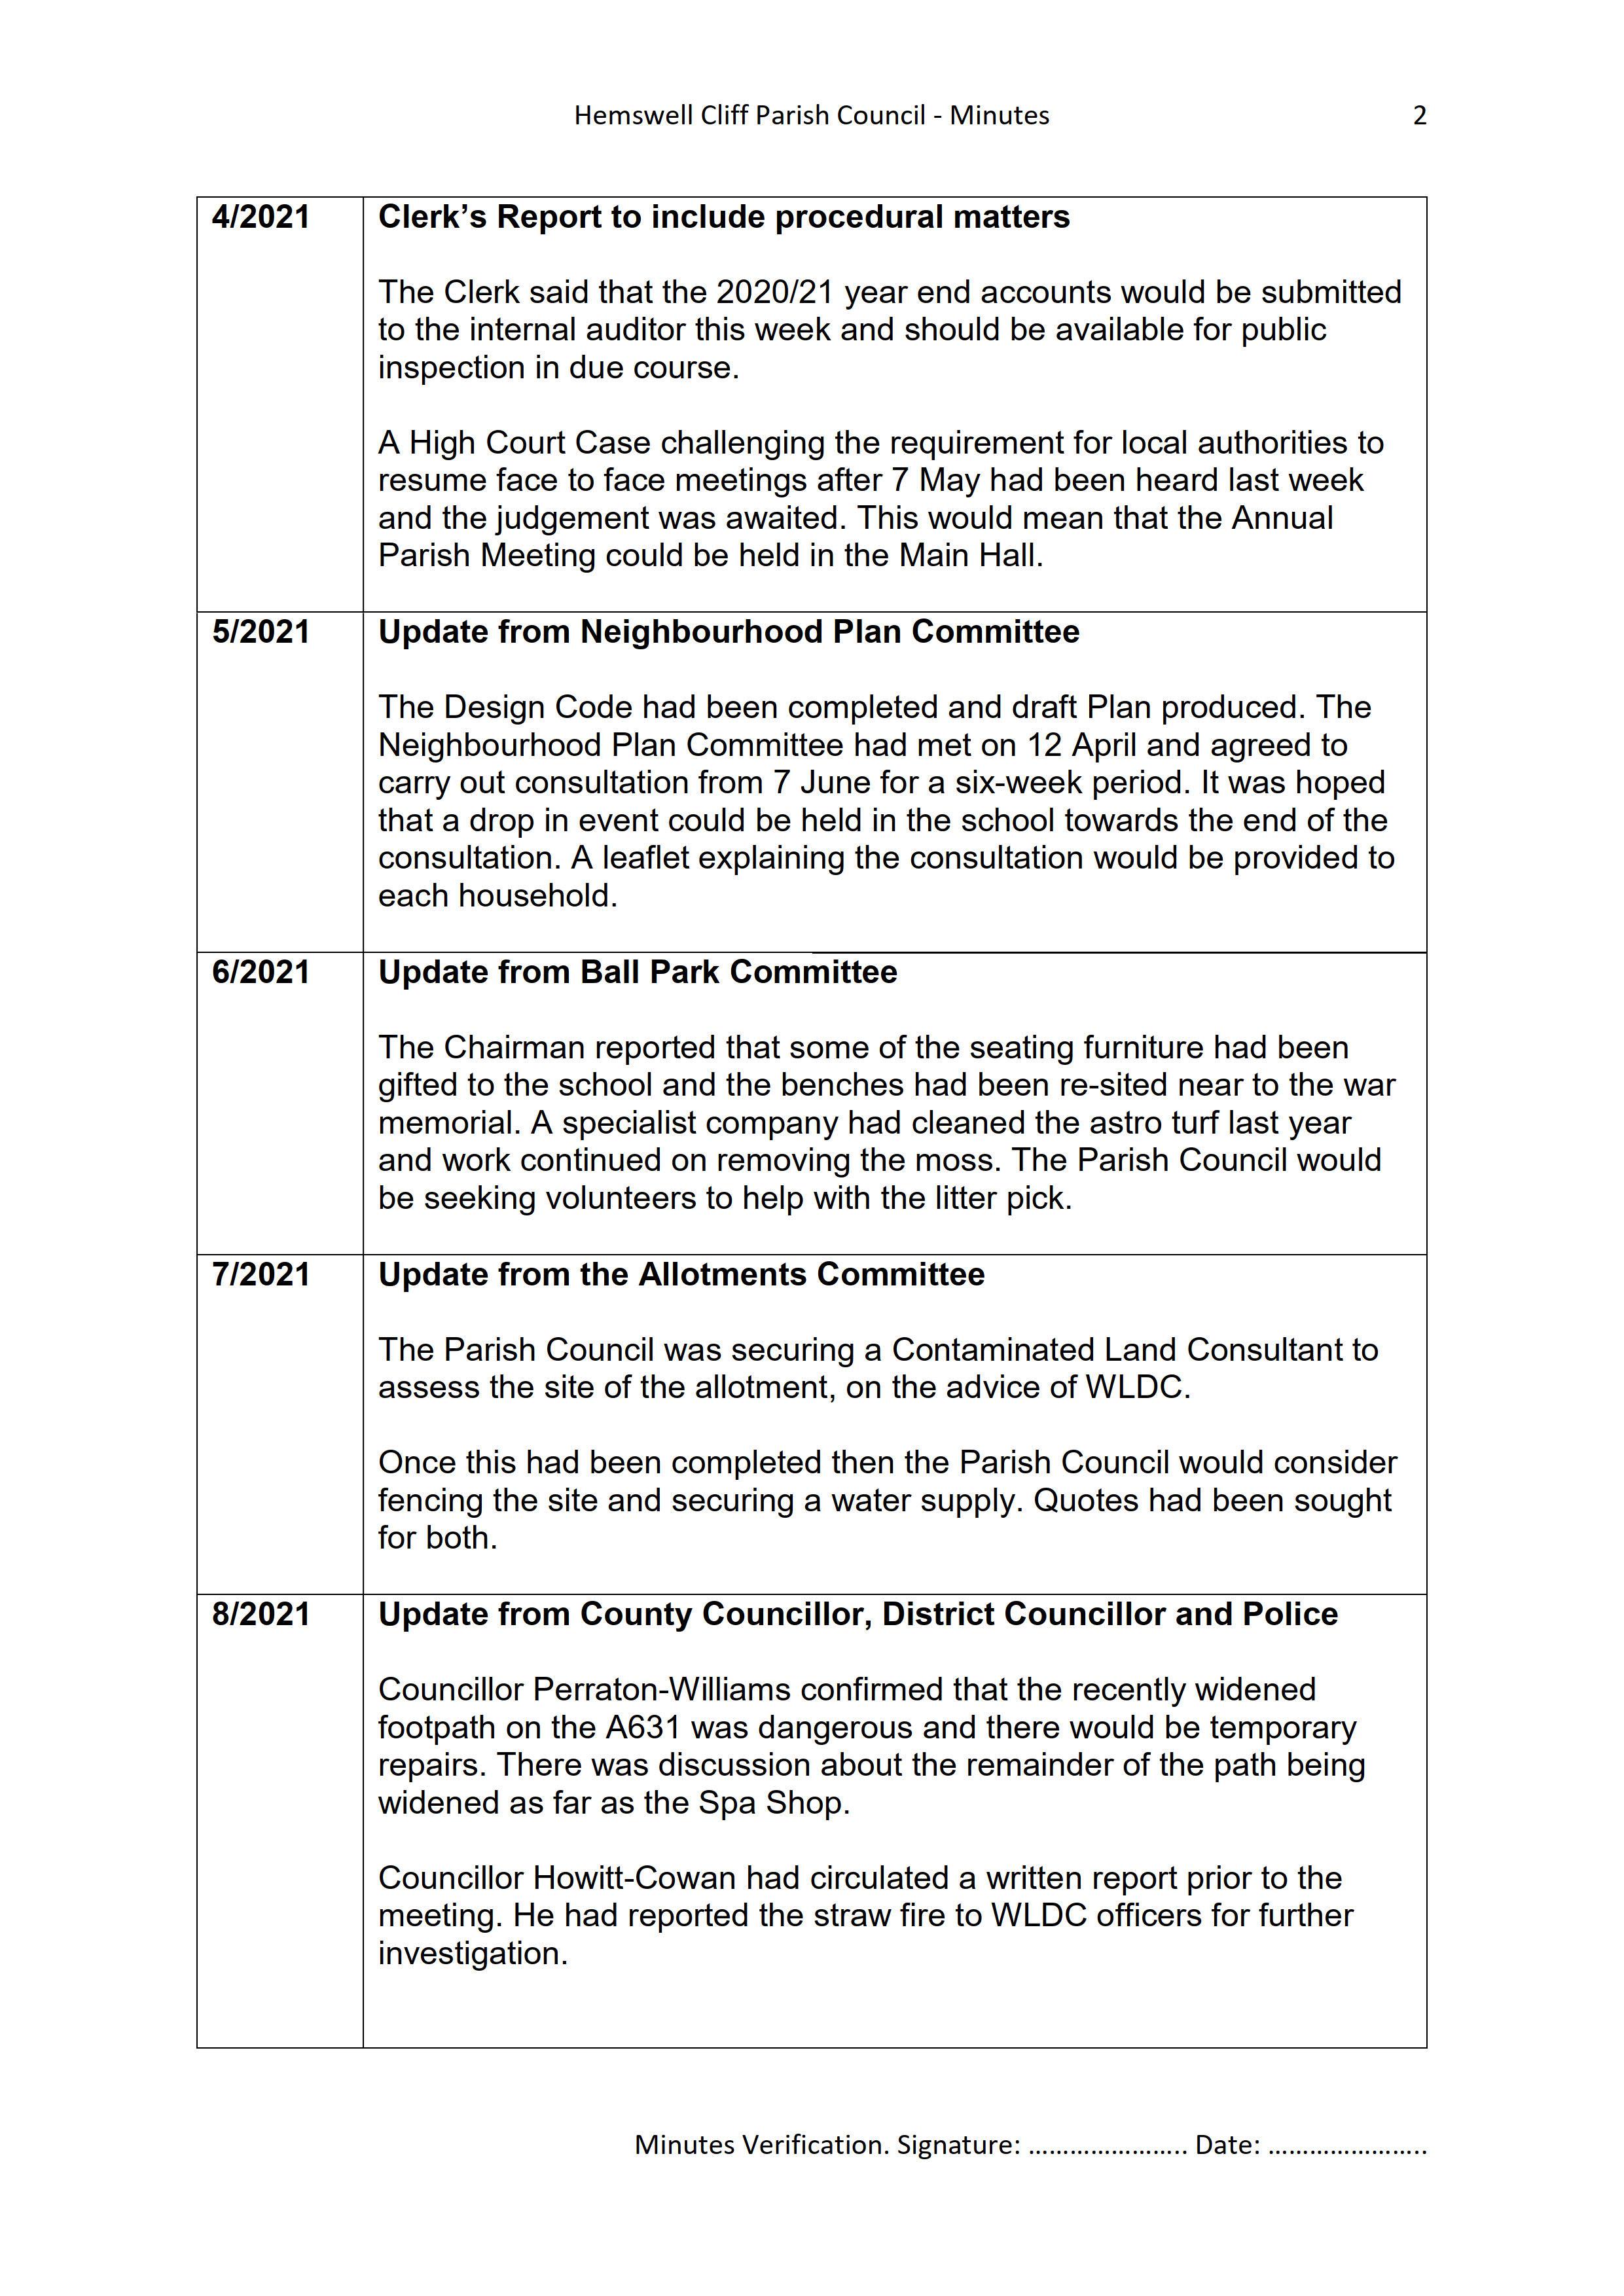 HCPC_Annual_Parish_Meeting_Minutes_26.04.21_2.jpg